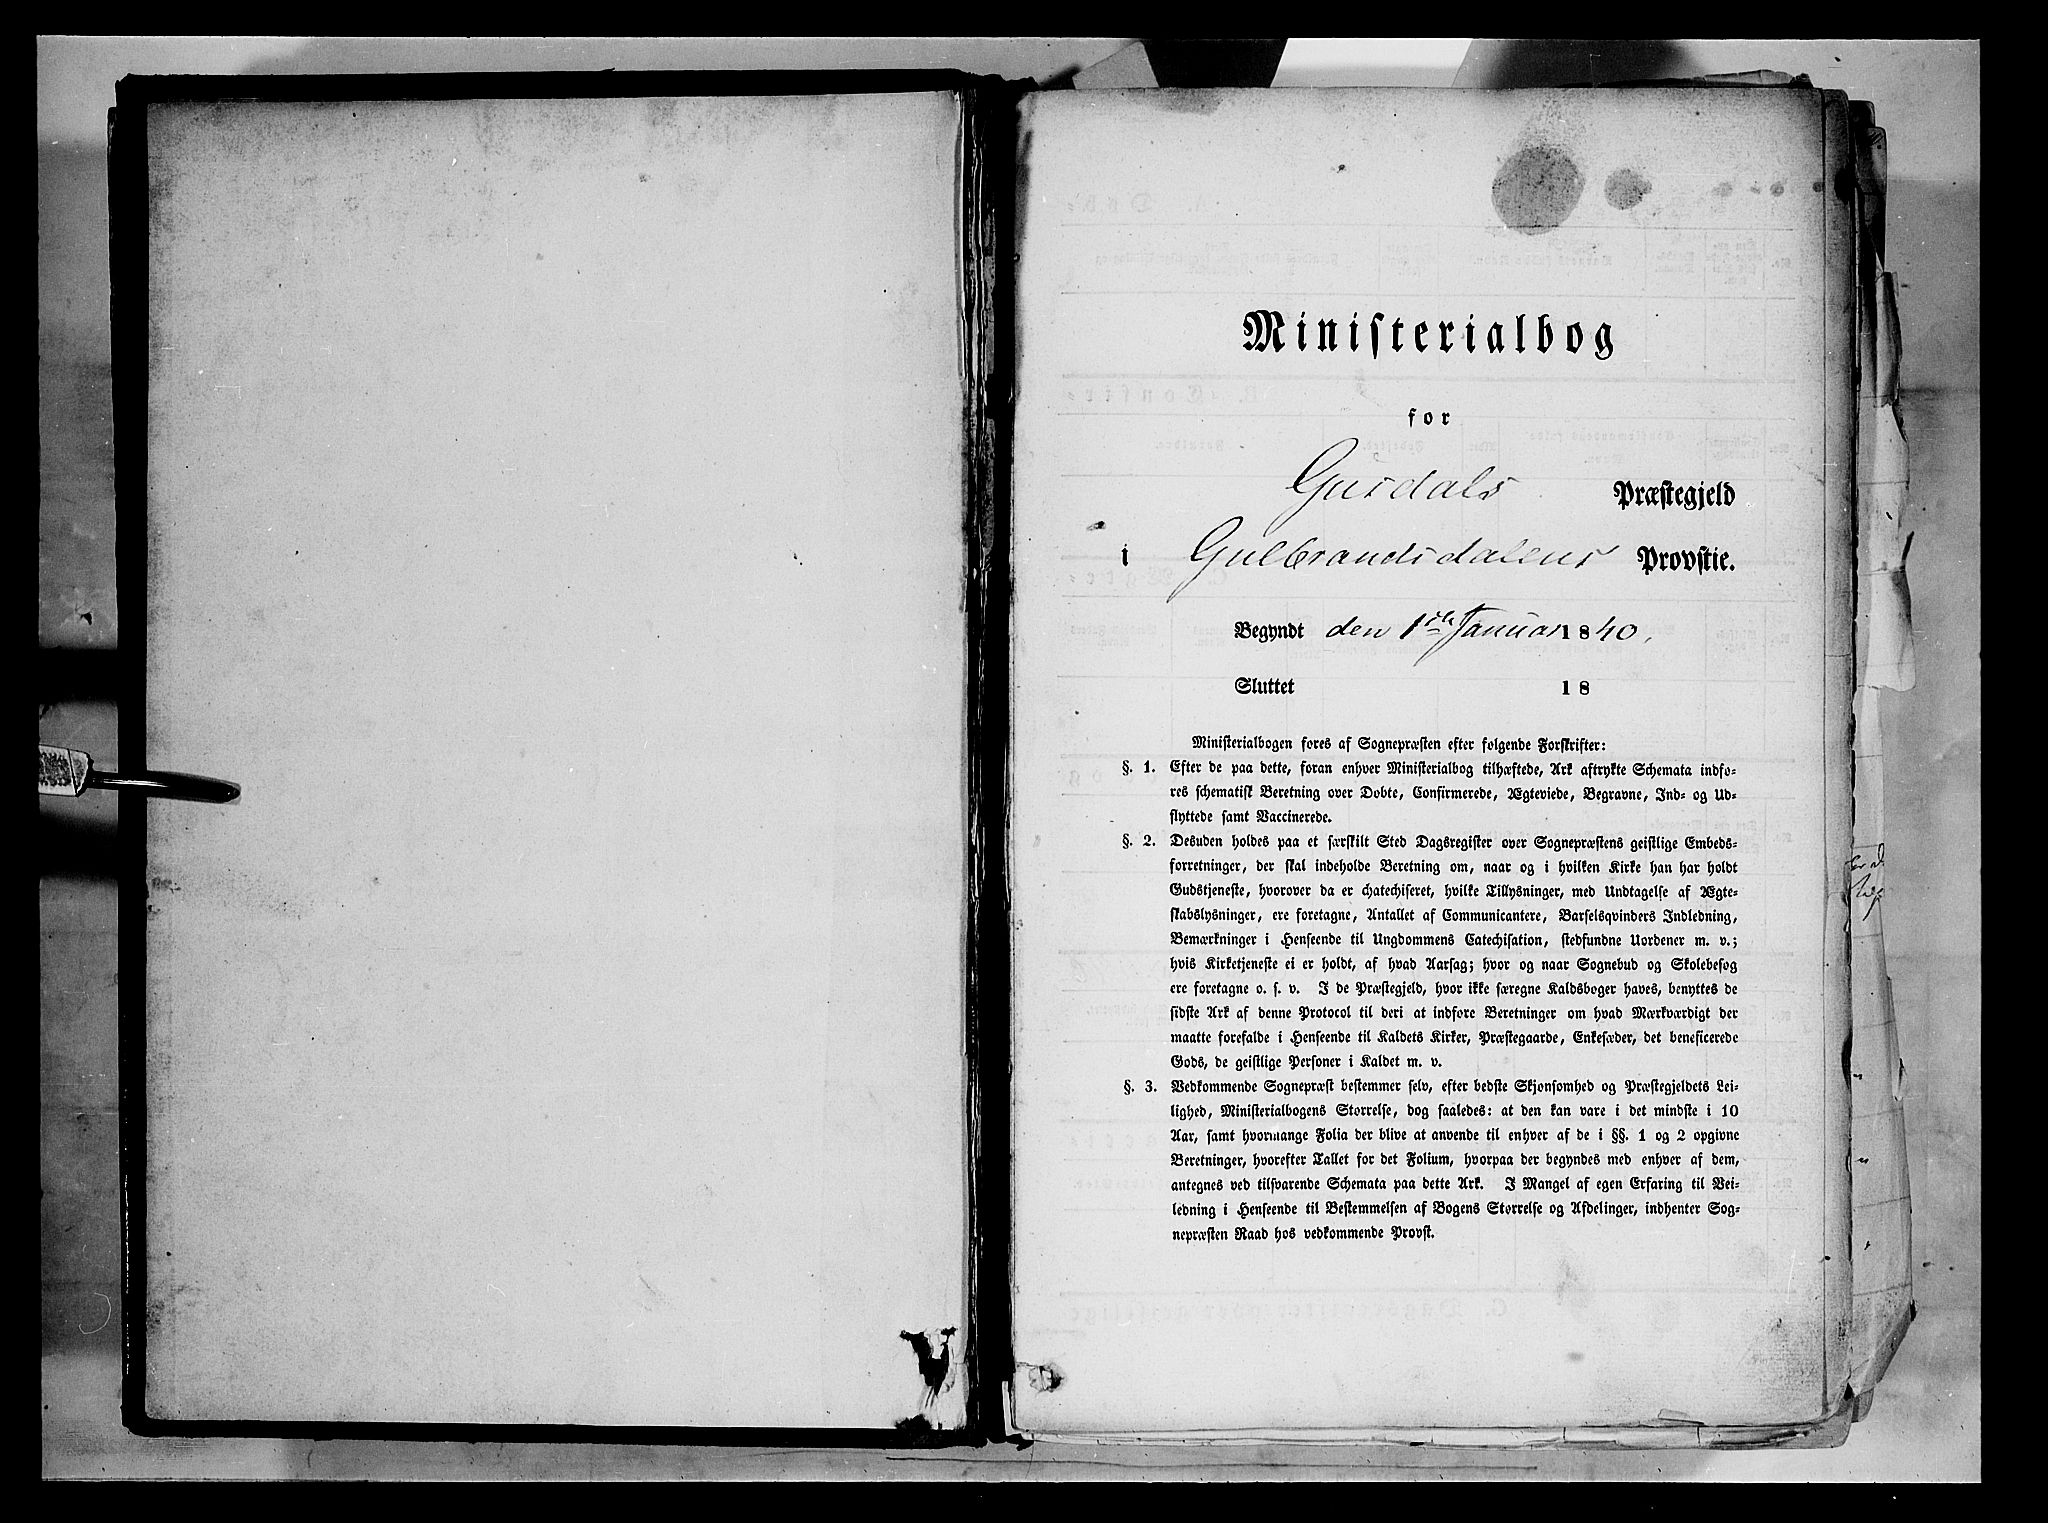 SAH, Gausdal prestekontor, Ministerialbok nr. 7, 1840-1850